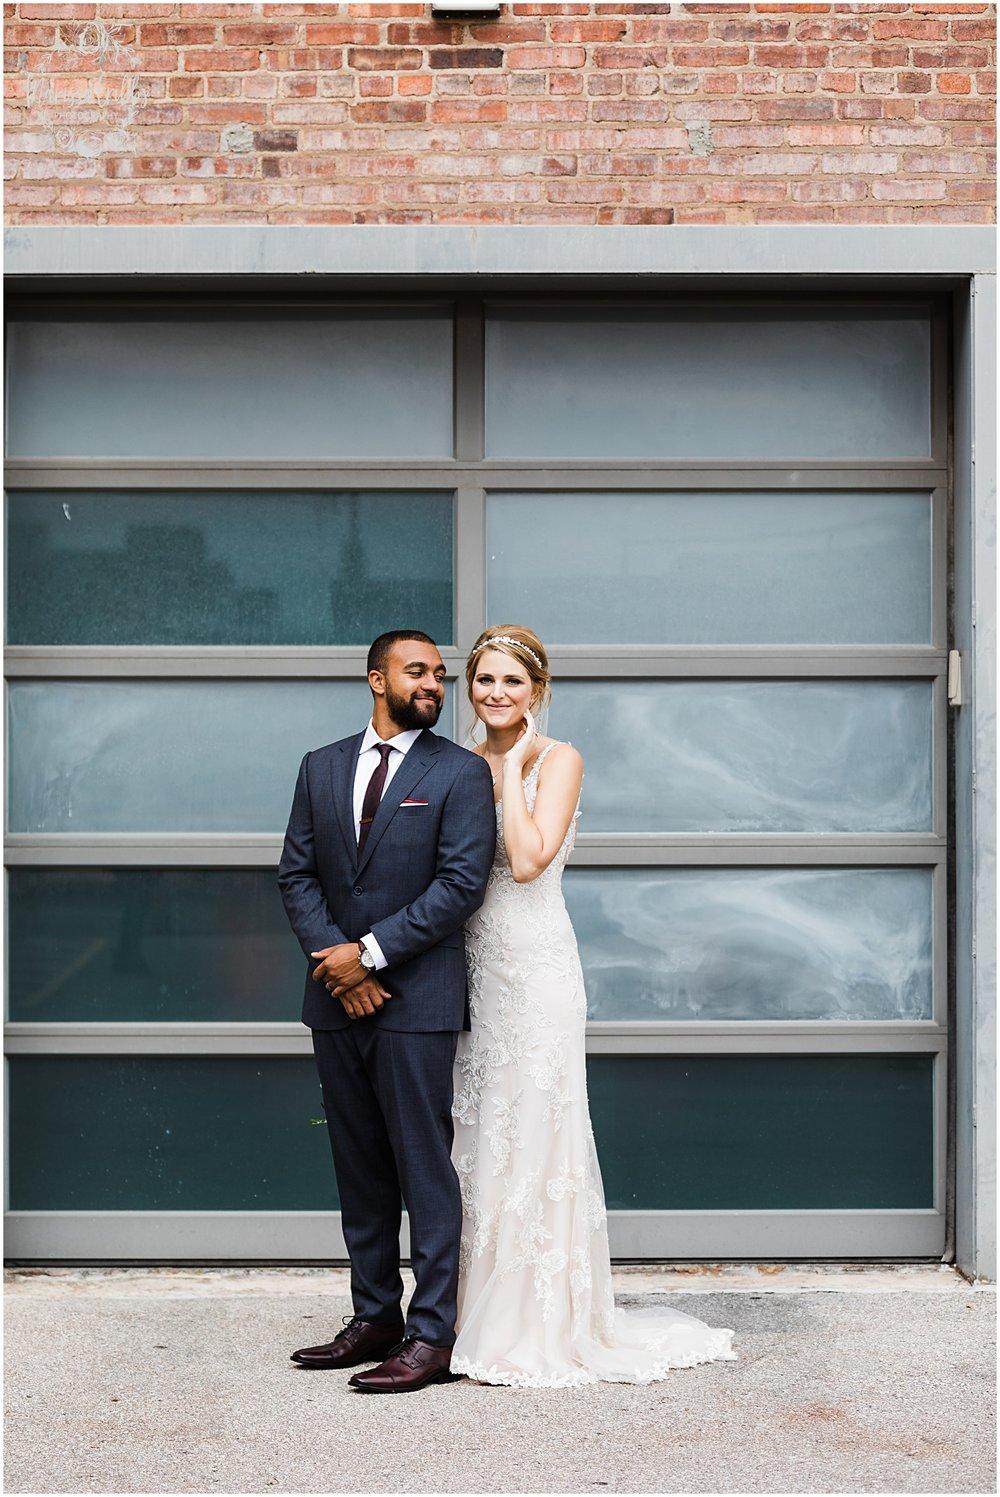 BAUER WEDDING | KELSEA & JUSTIN | MARISSA CRIBBS PHOTOGRAPHY_6534.jpg